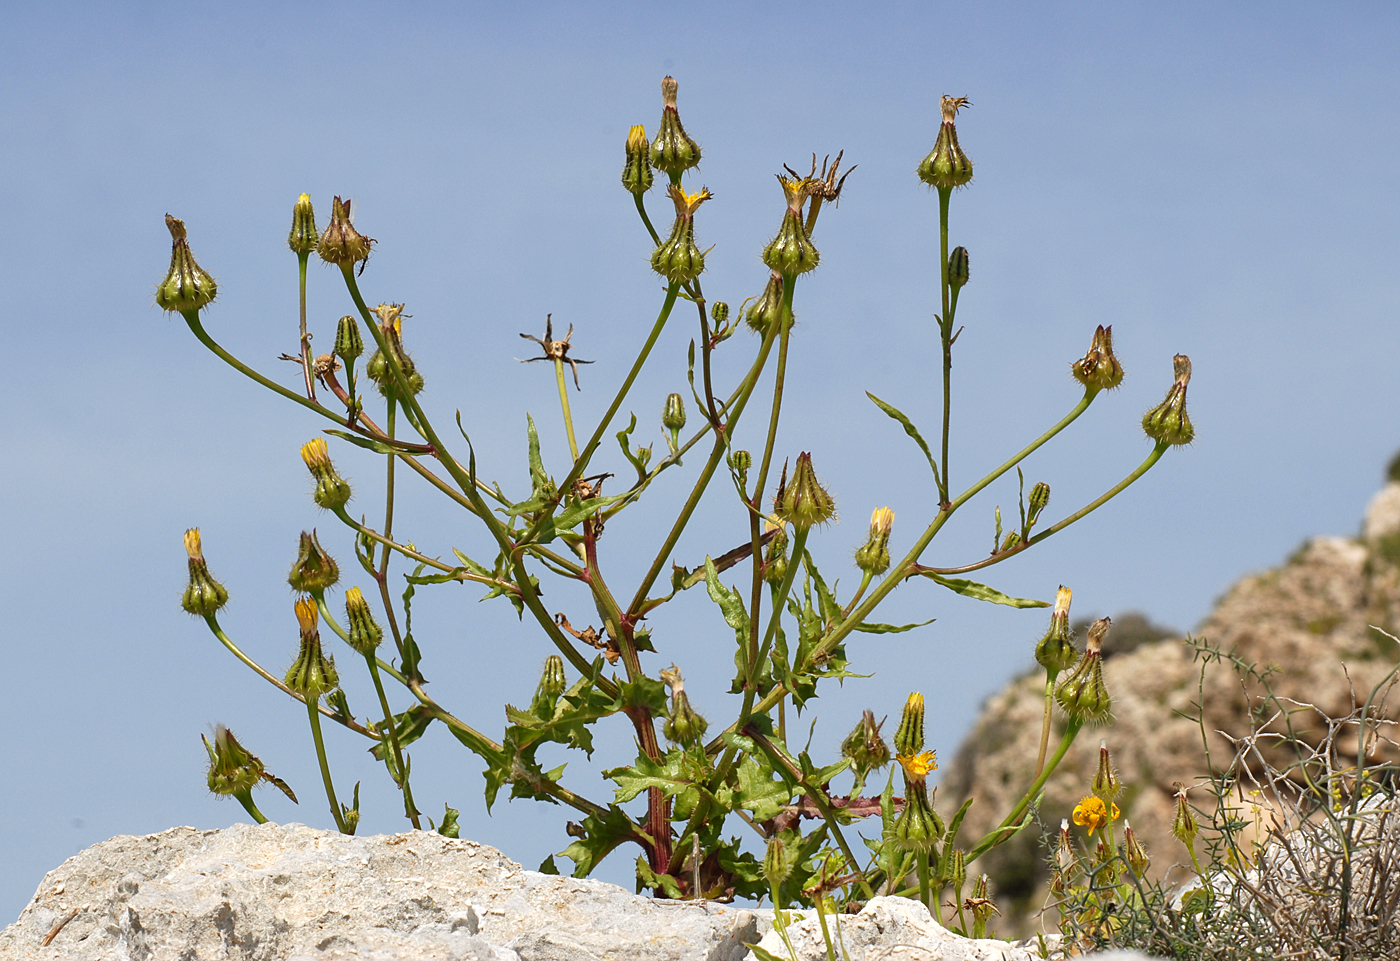 https://pictures.bgbm.org/digilib/Scaler?fn=Cyprus/Urospermum_picroides_A2.jpg&mo=file